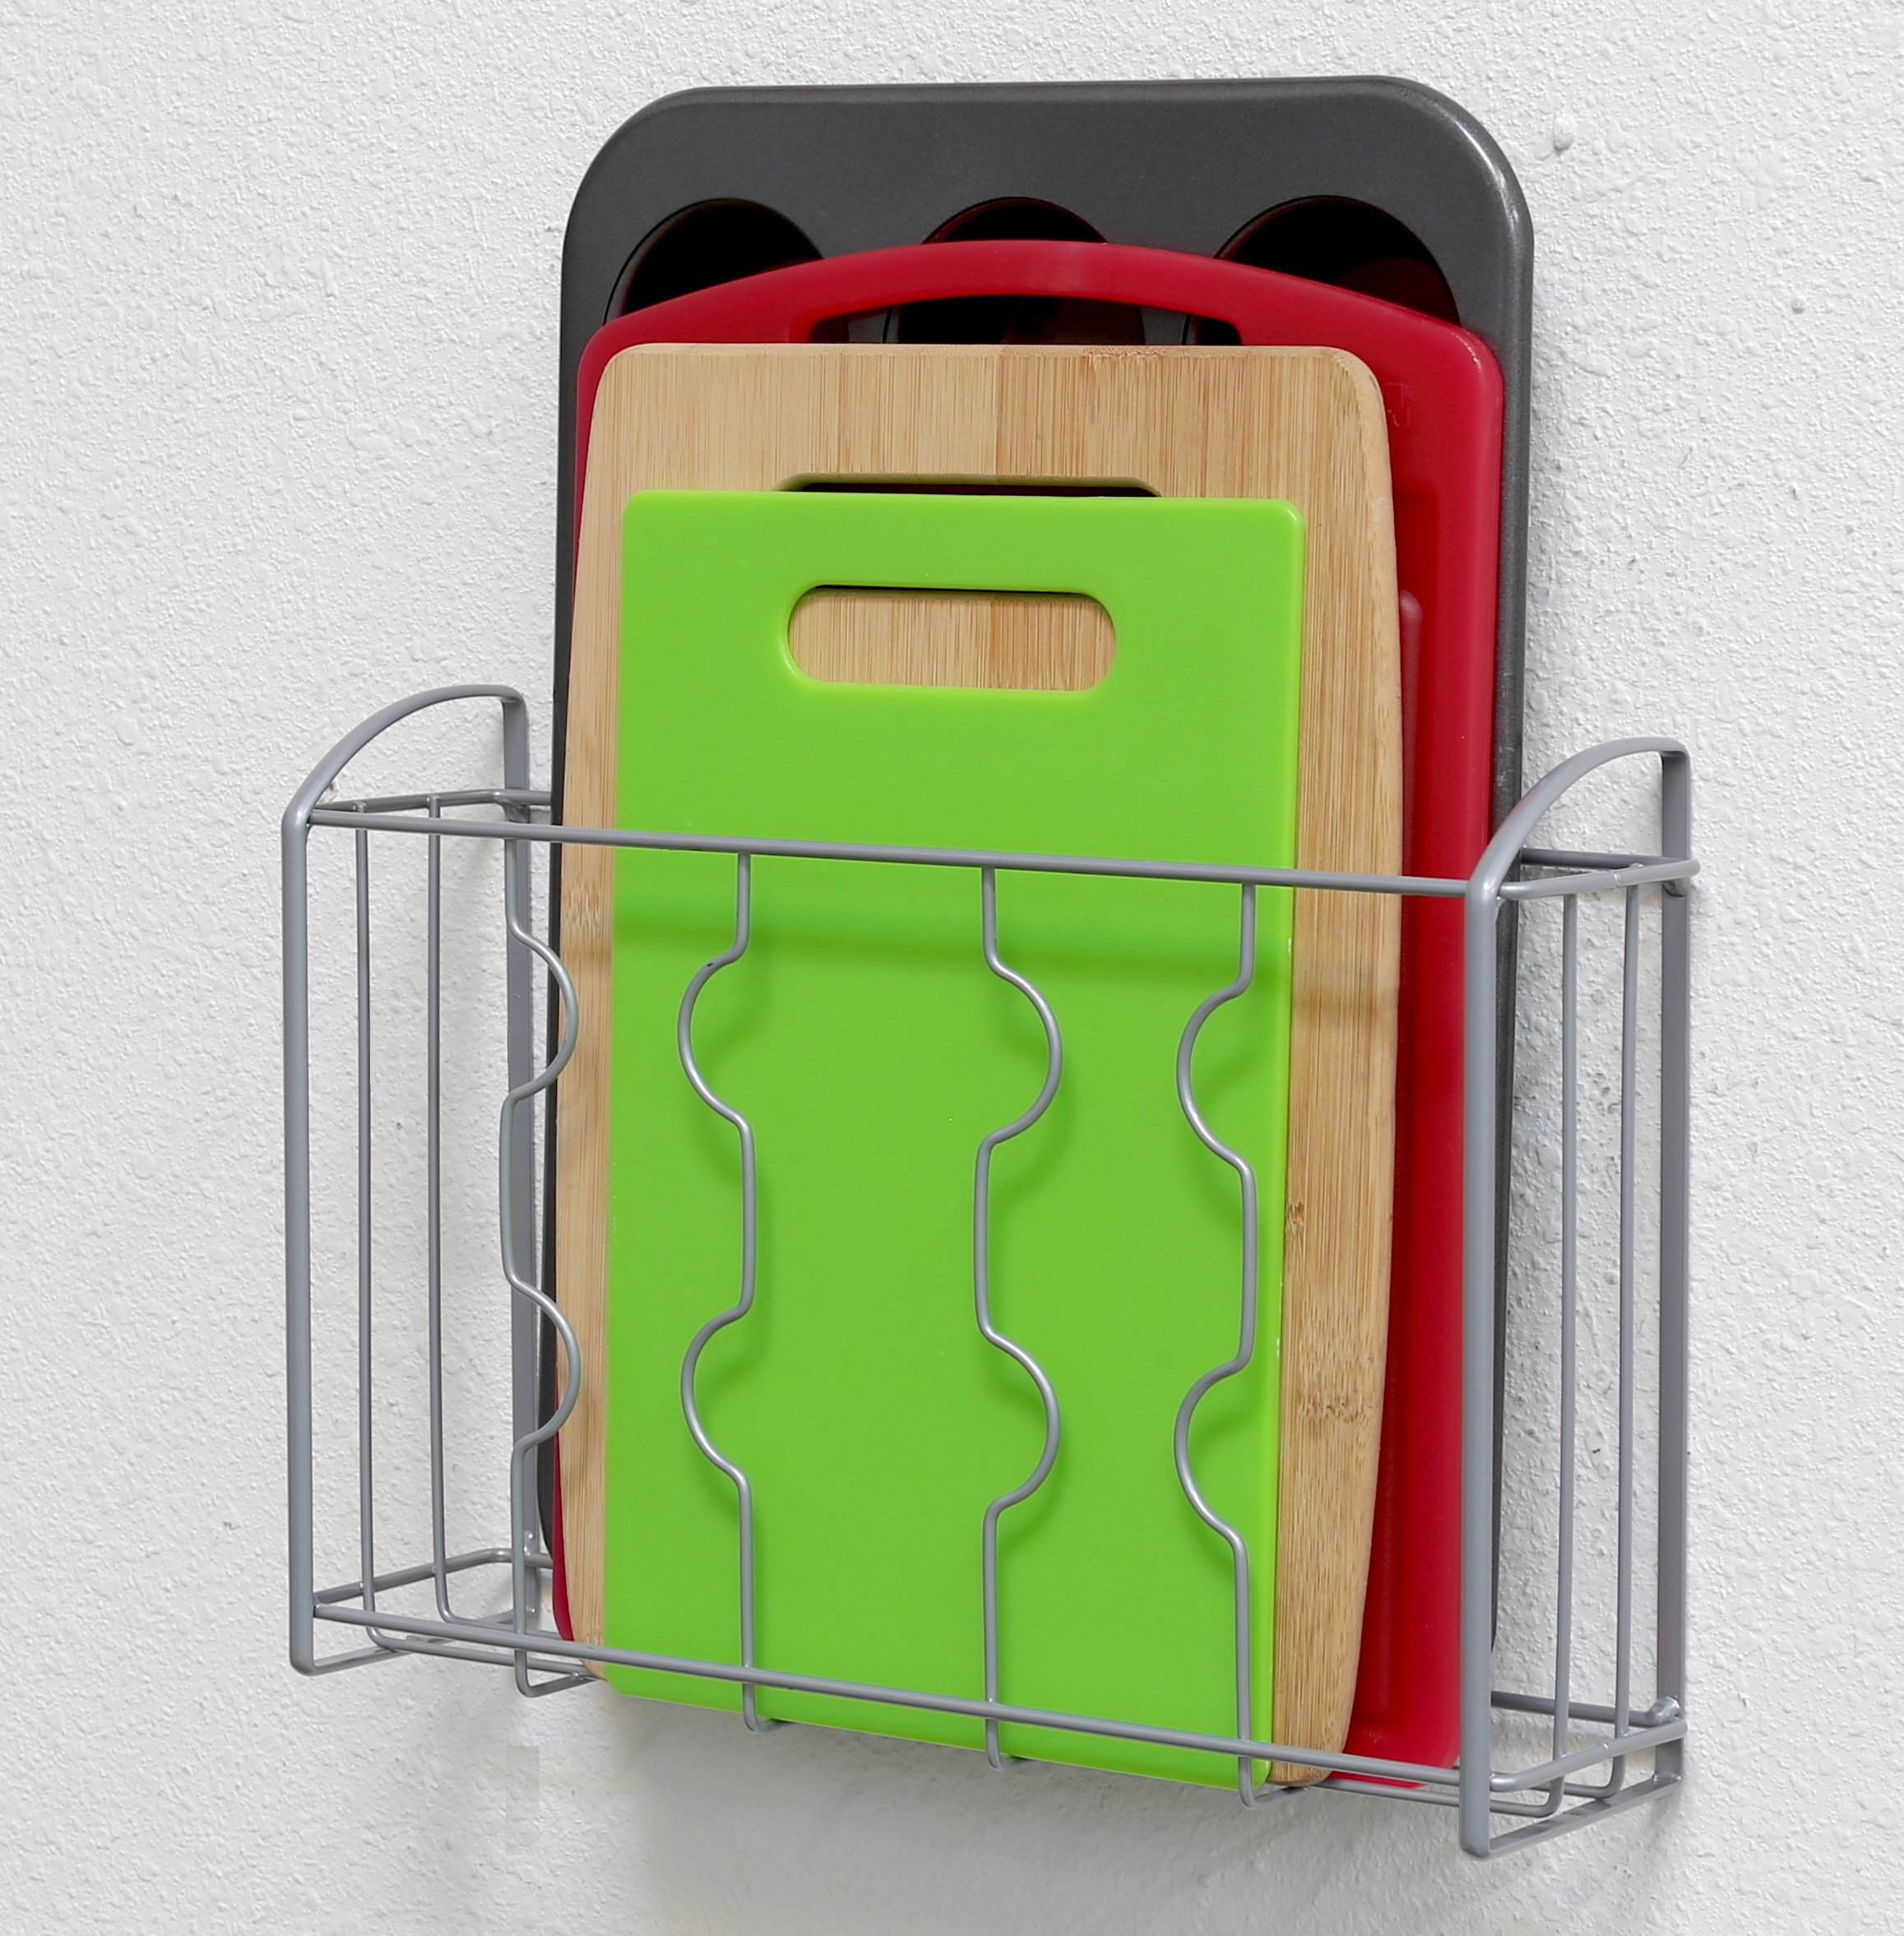 over the cabinet door organizer holder cutting board bakeware cookie sheet rack 707129800435 ebay. Black Bedroom Furniture Sets. Home Design Ideas